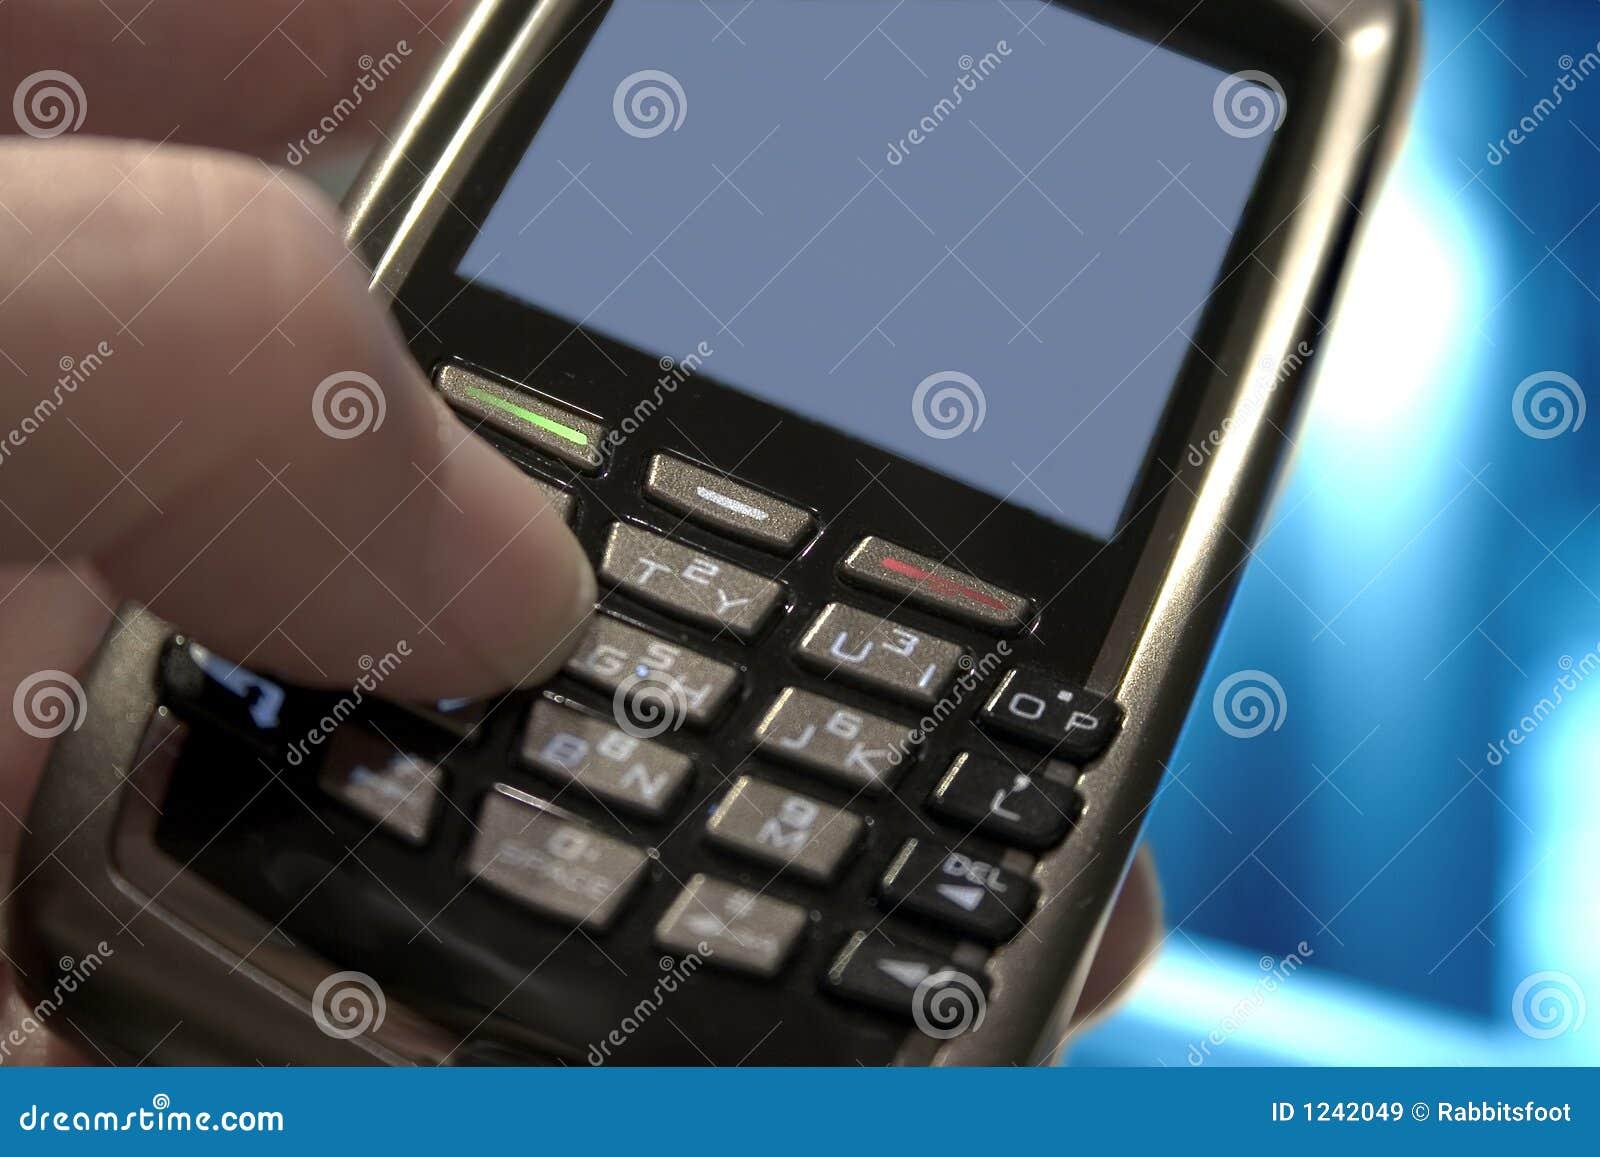 Blackberry in Hand